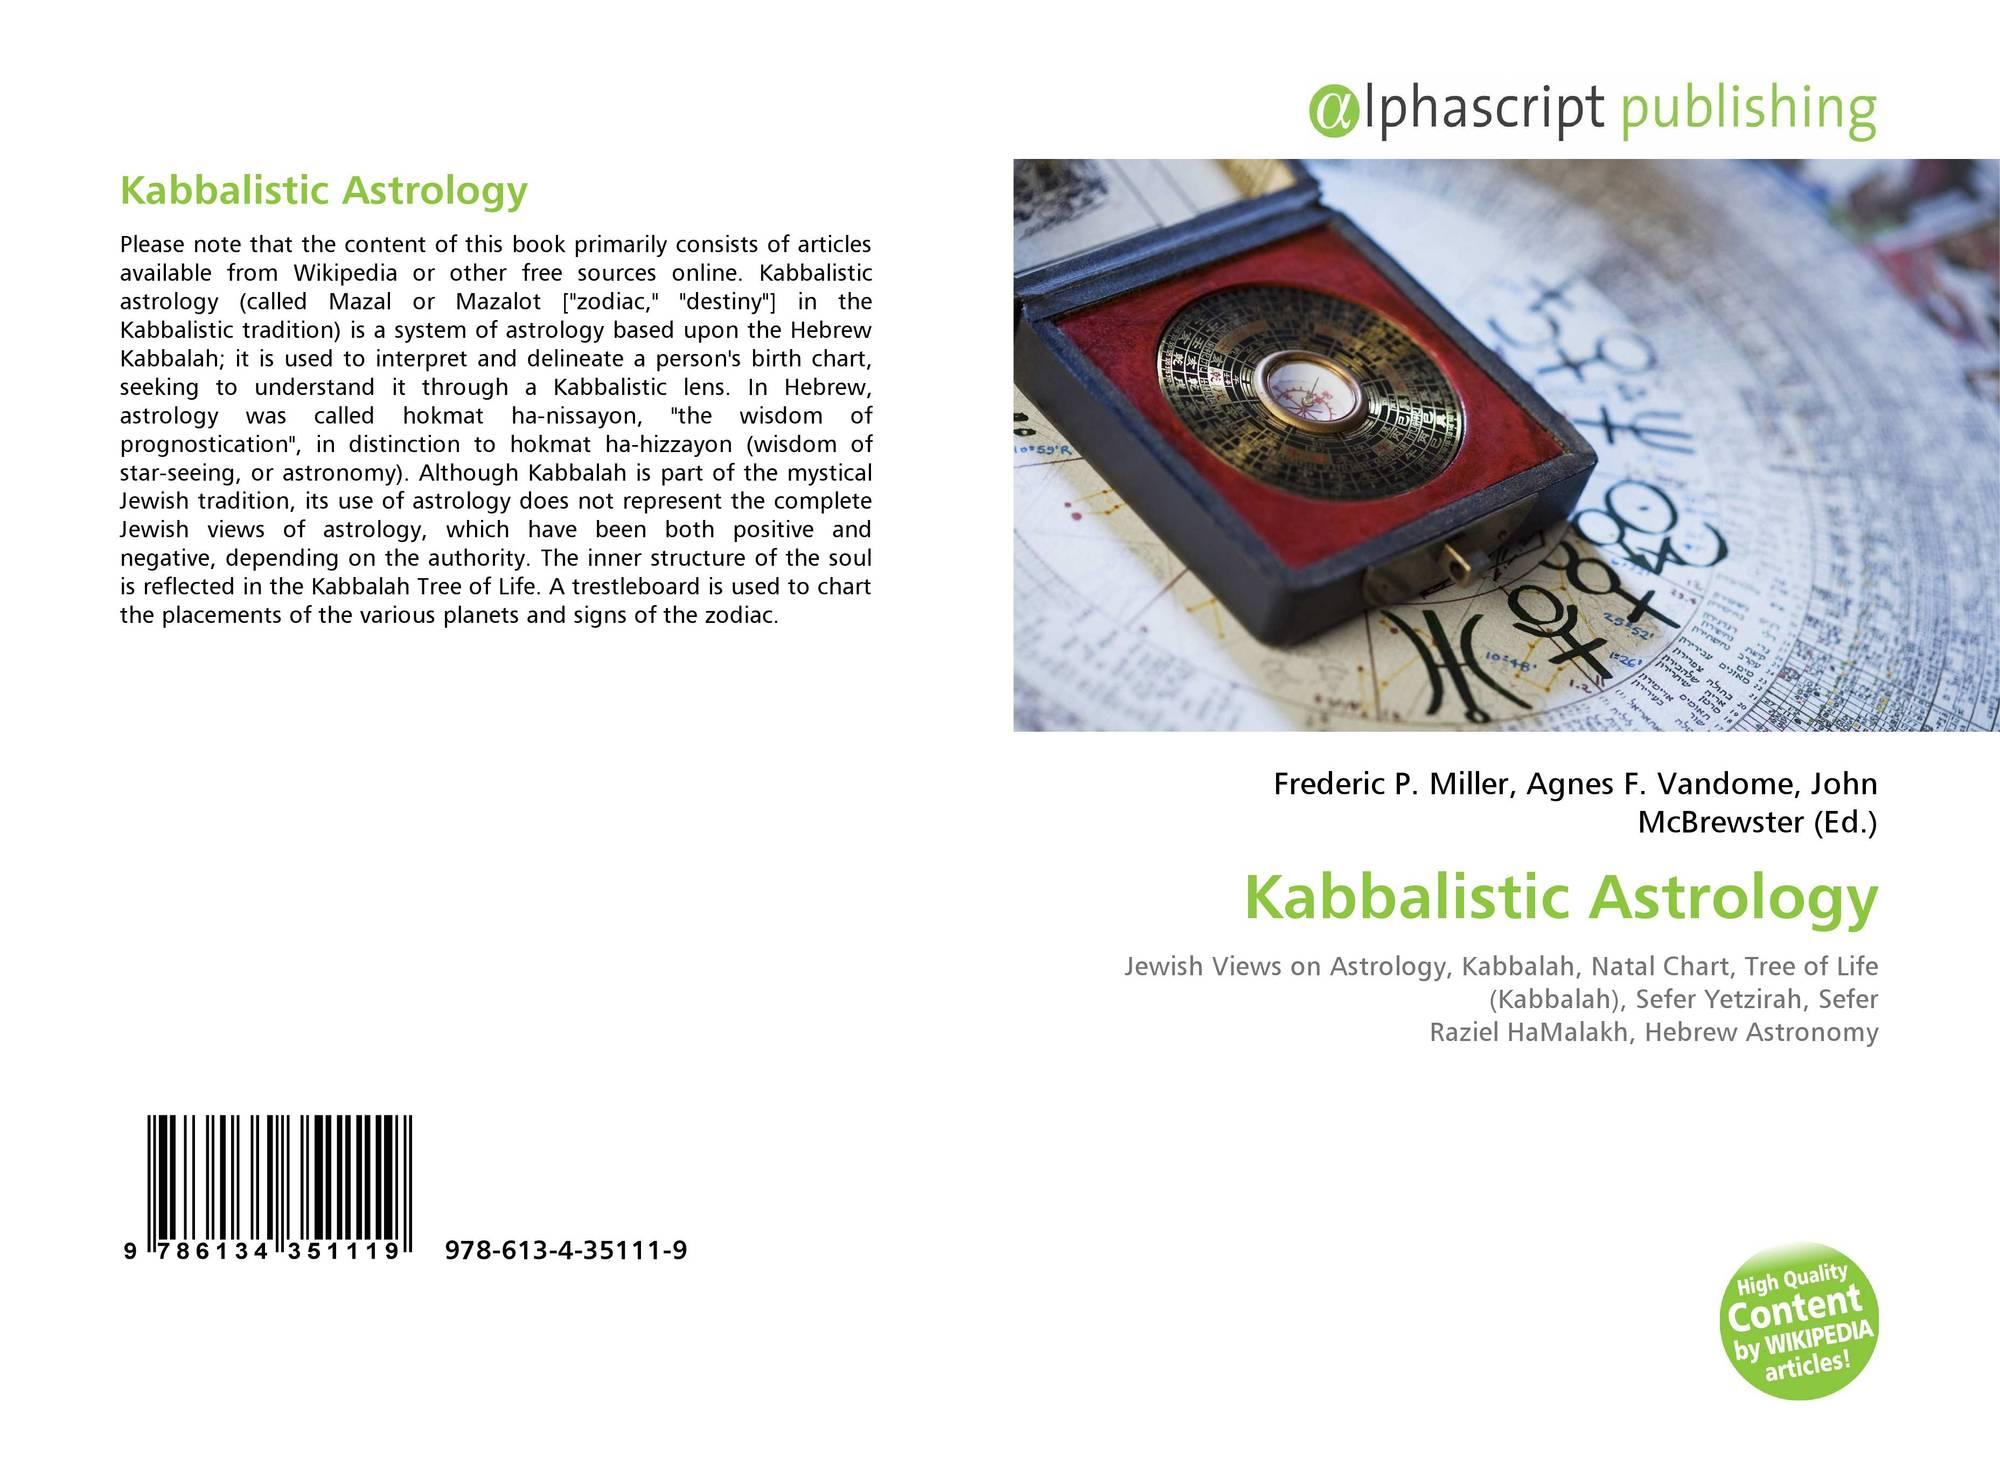 Kabbalistic Astrology 978 613 4 35111 9 6134351113 9786134351119